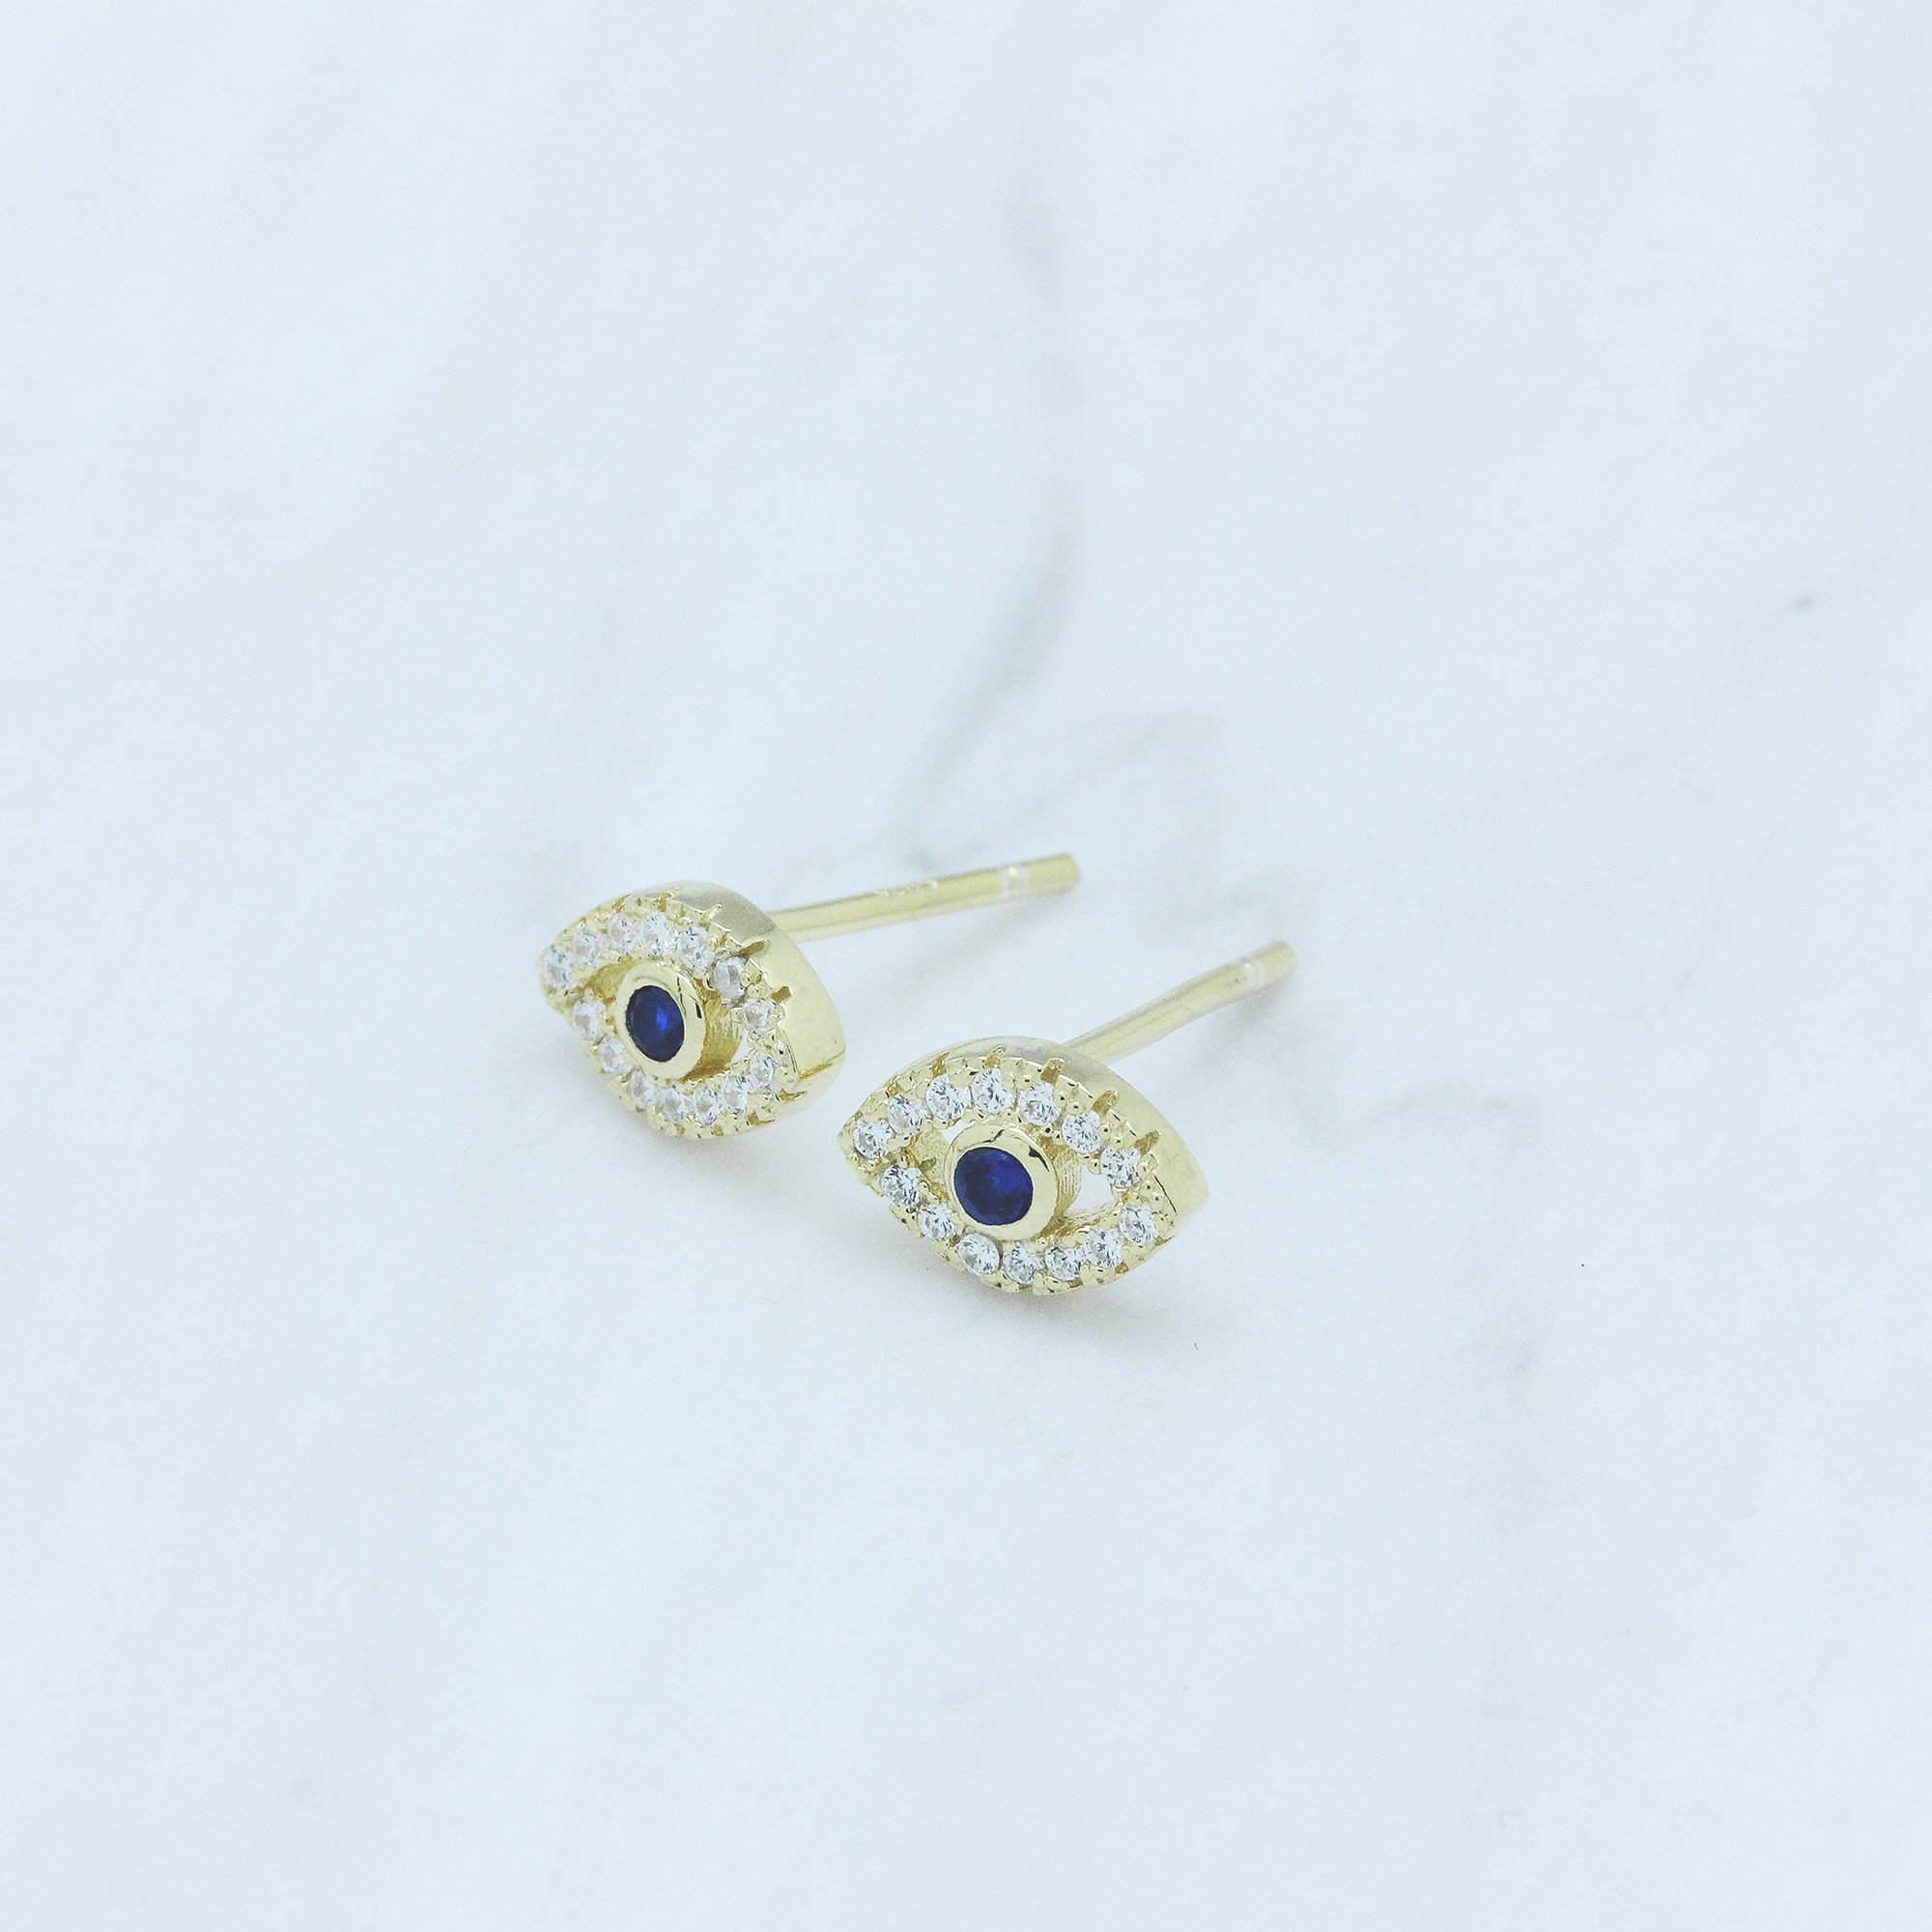 14k Yellow Gold-Plated Sterling Silver Cubic Zirconia Mini Evil Eye Jewish Symbol Stud Earrings